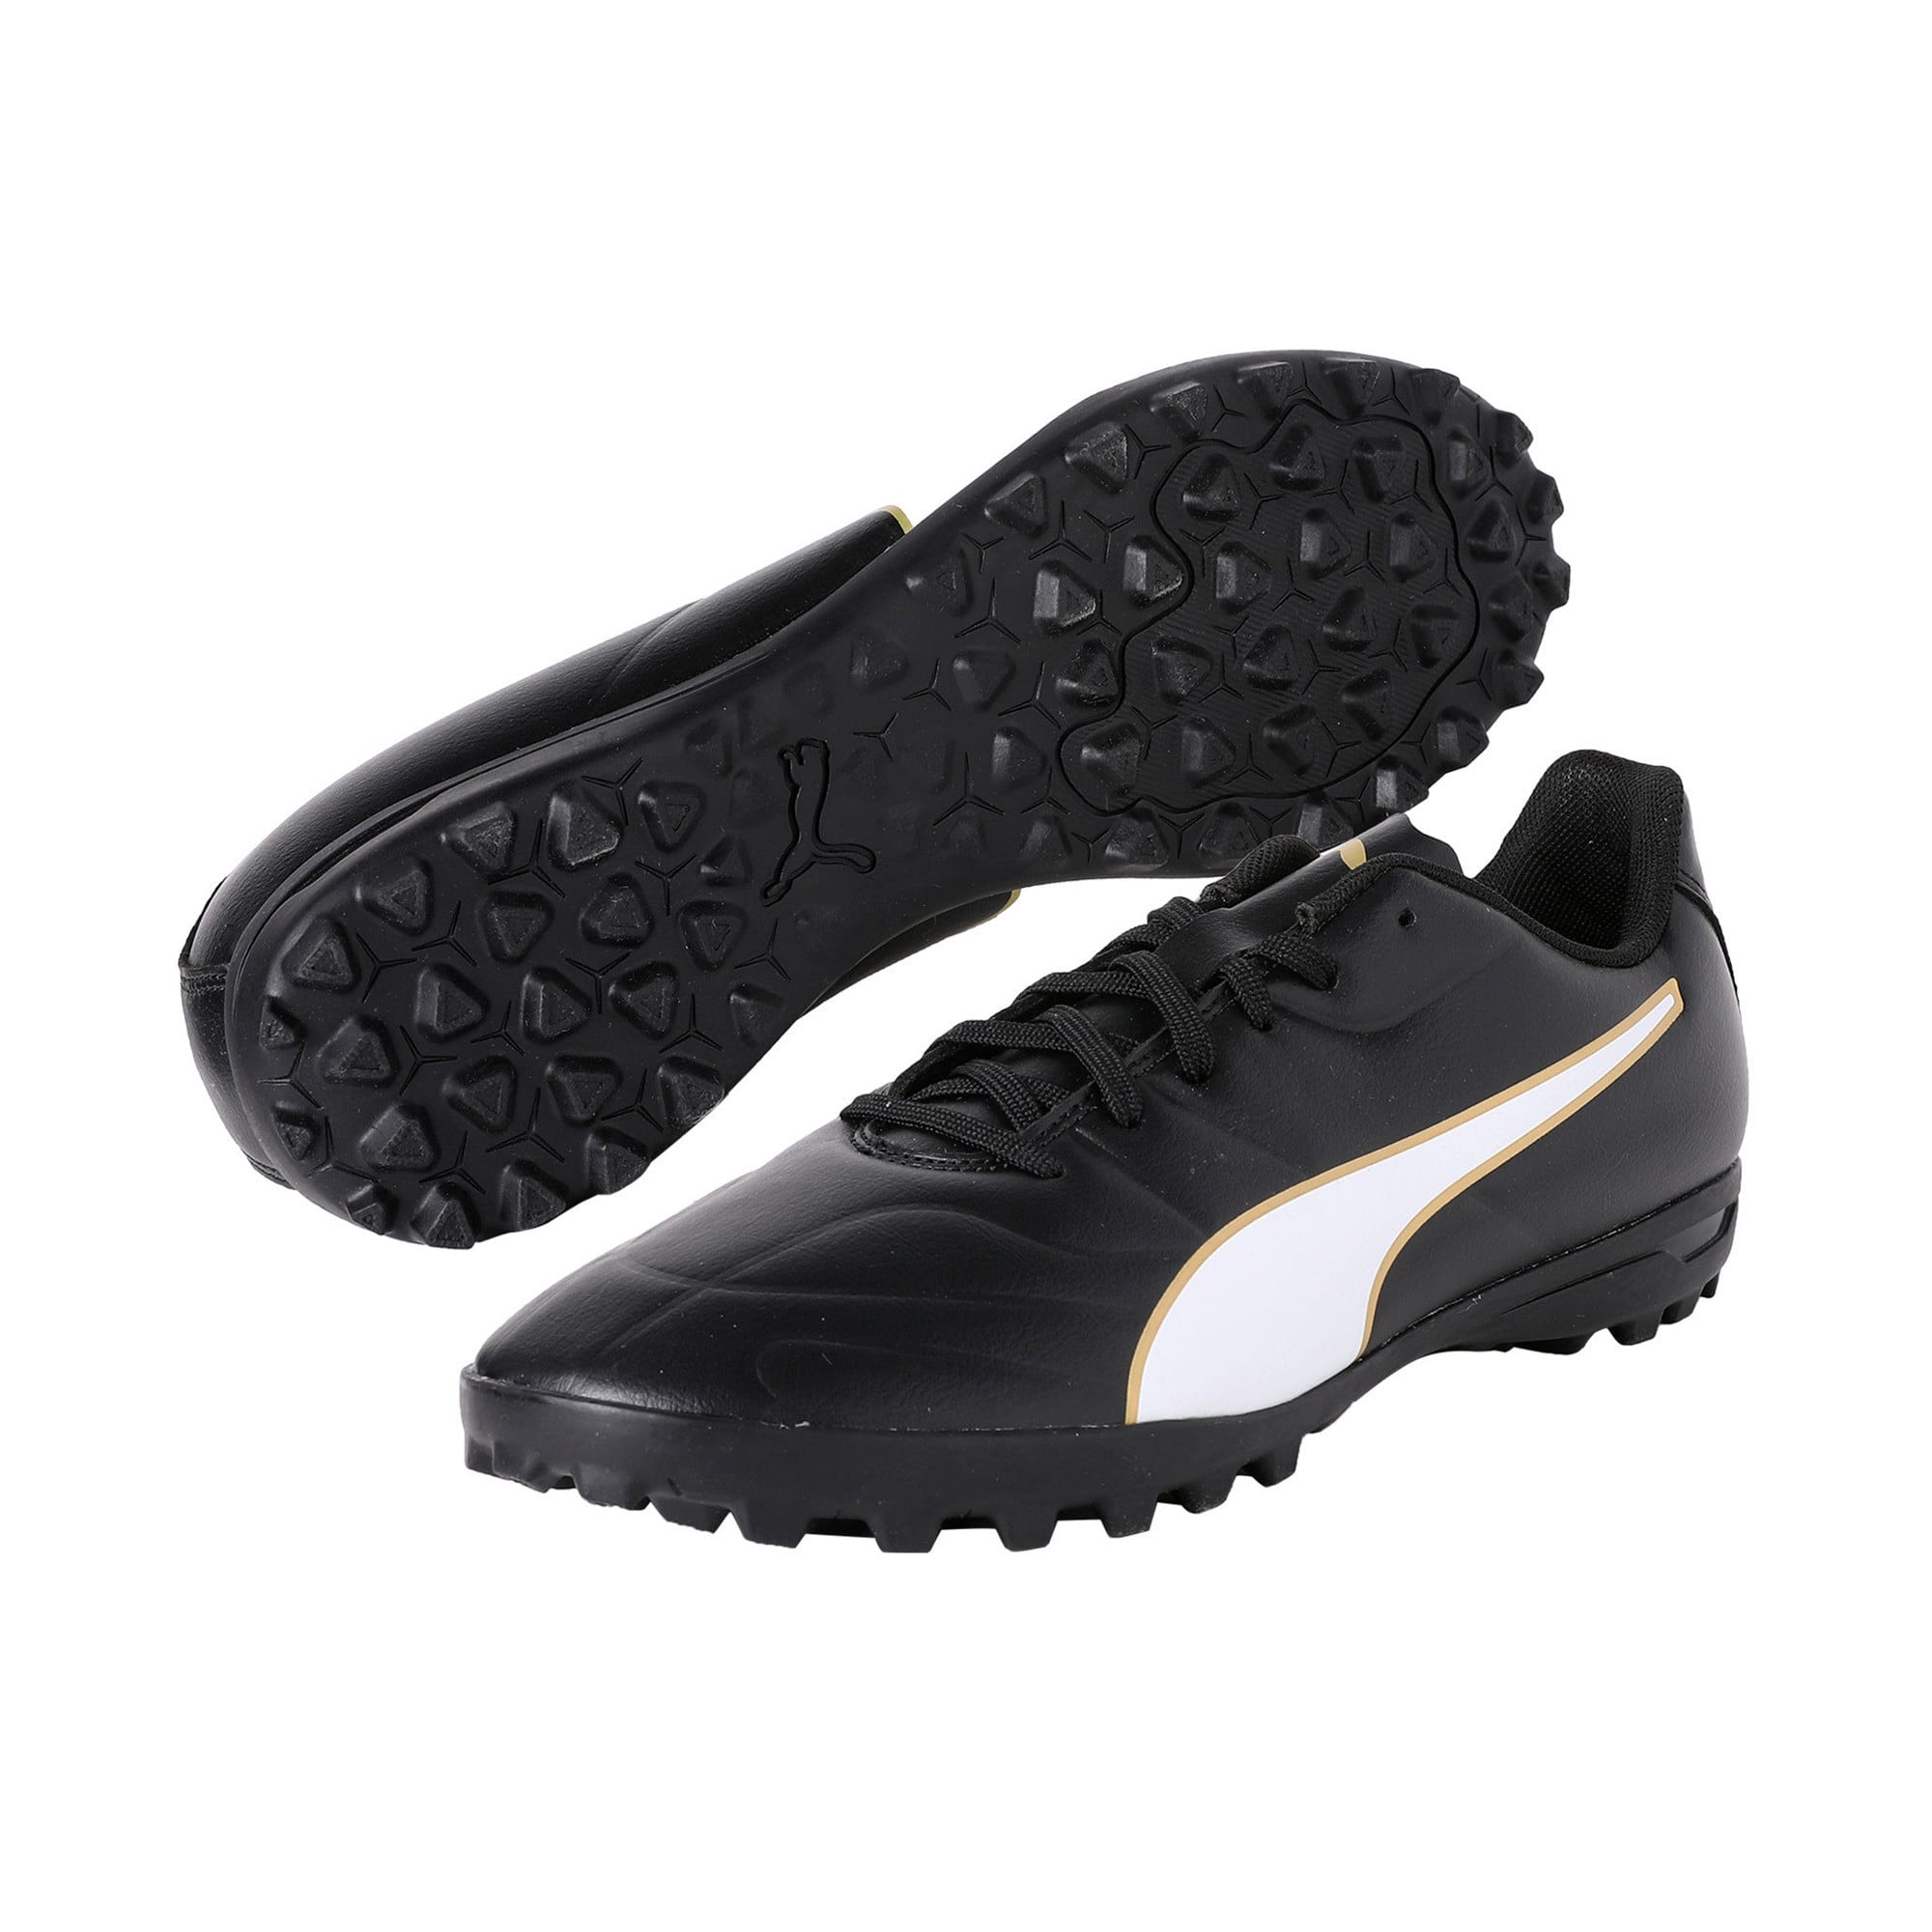 Thumbnail 2 of Classico C II Men's Football Boots, Black-White-Gold, medium-IND